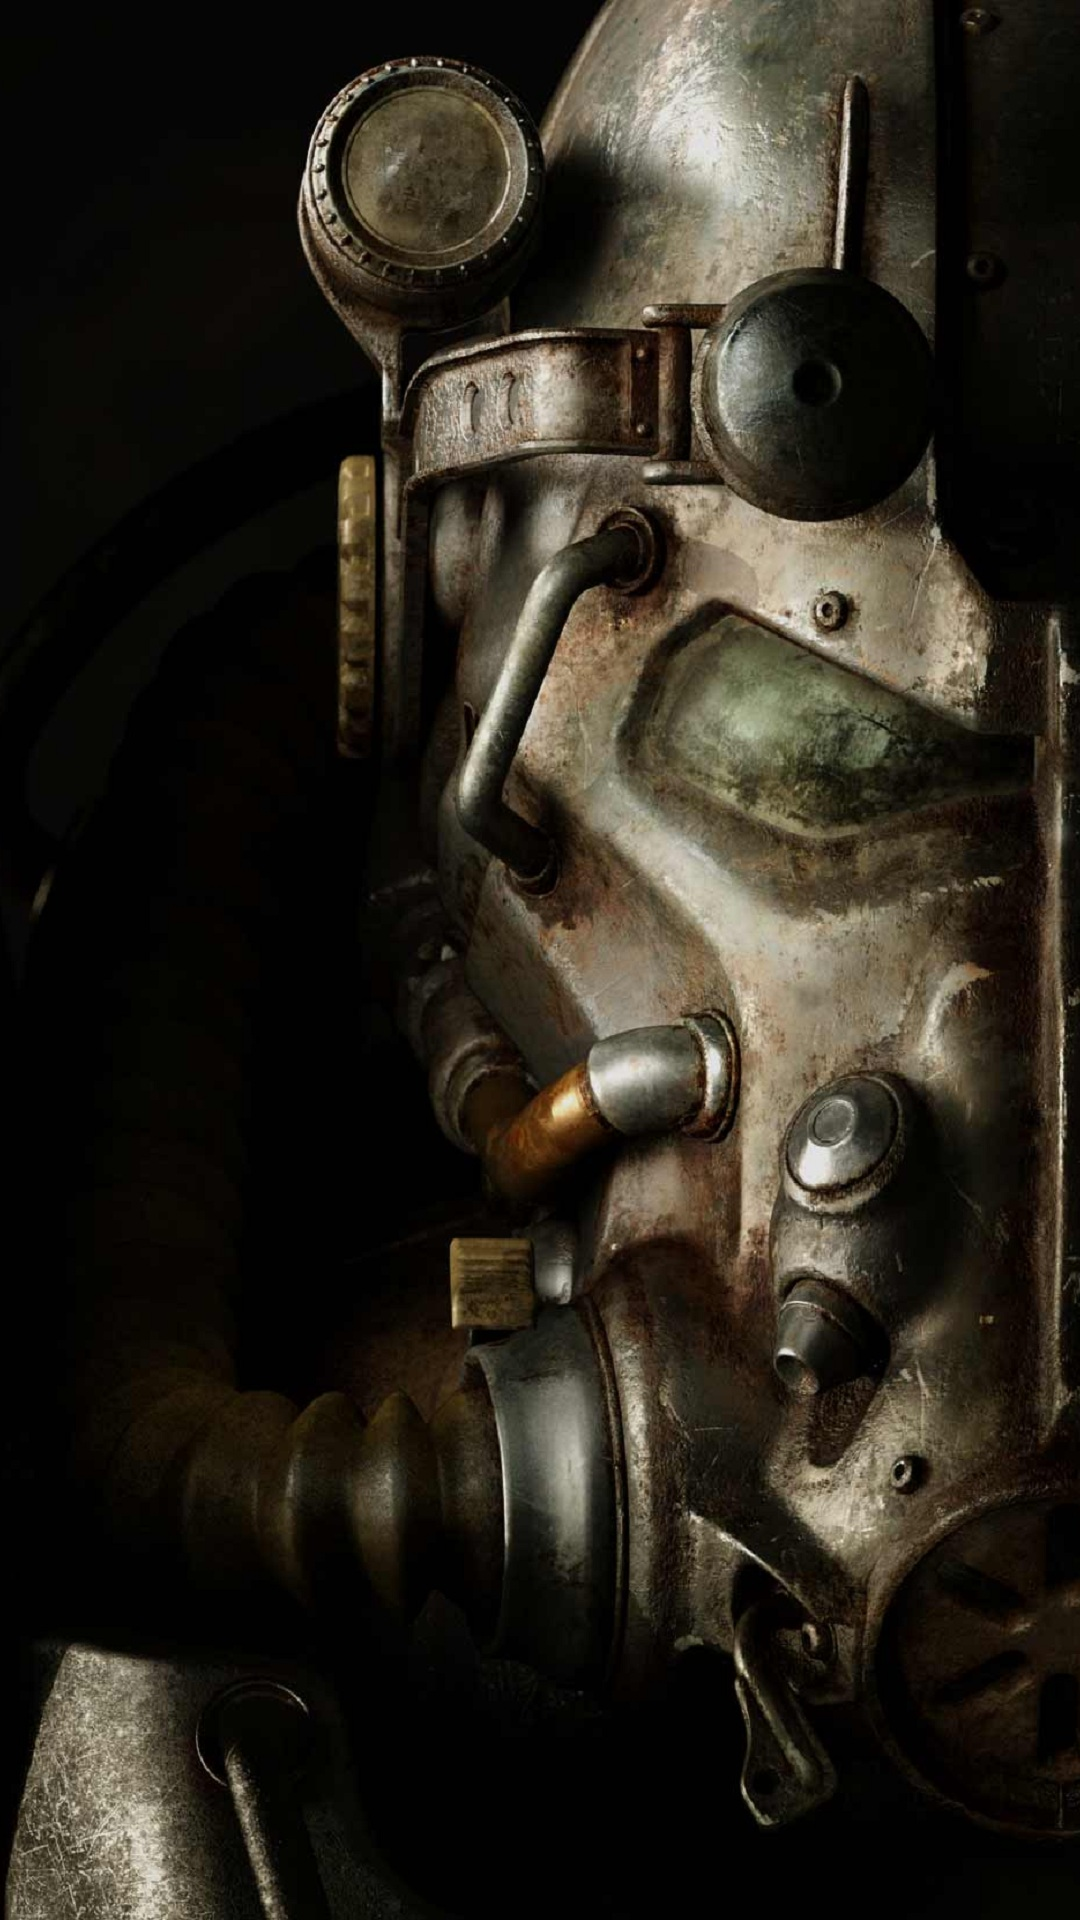 Fallout-1080x1920-Mobile-Album-on-Imgur-wallpaper-wpc580199